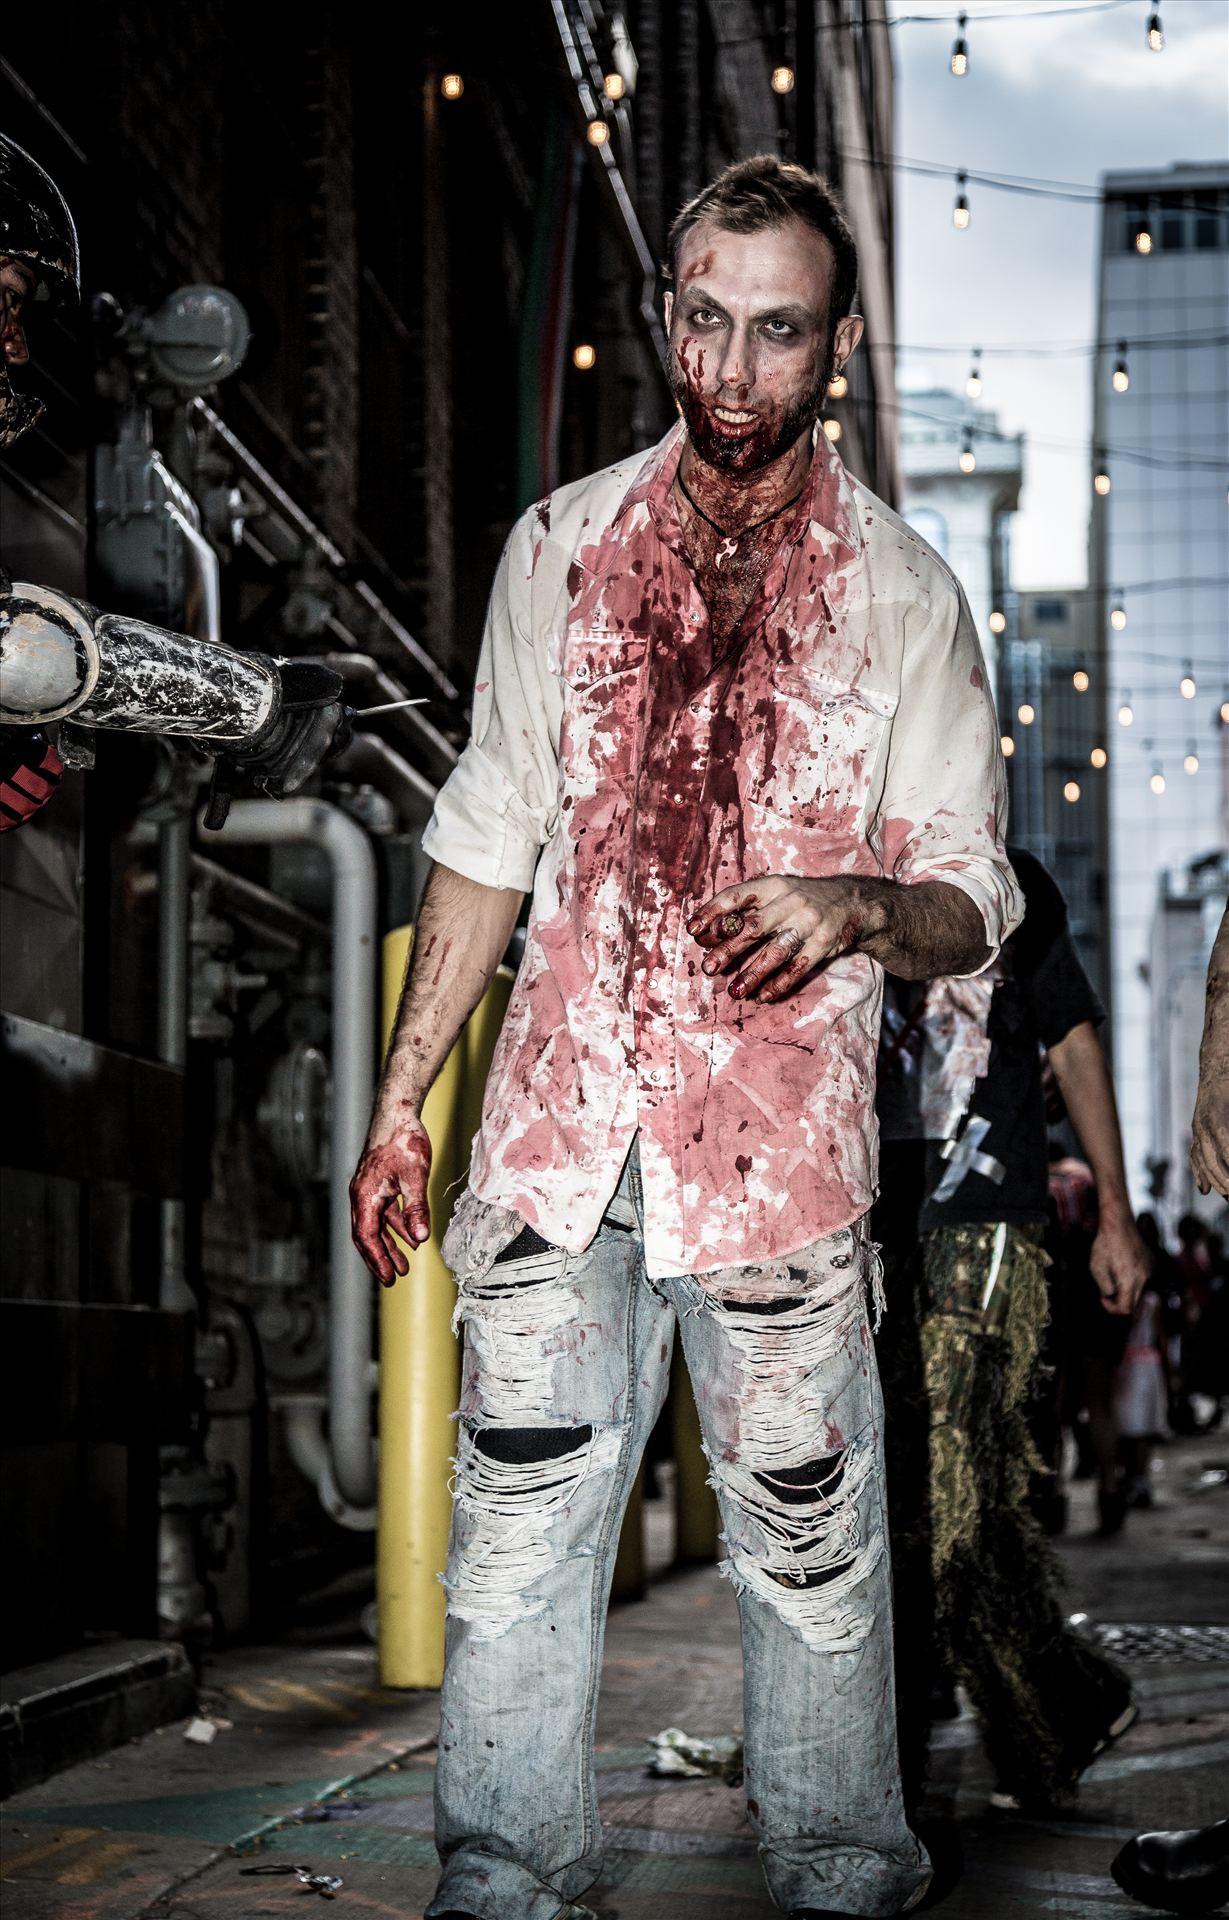 Denver Zombie Crawl 2015 12 -  by D Scott Smith